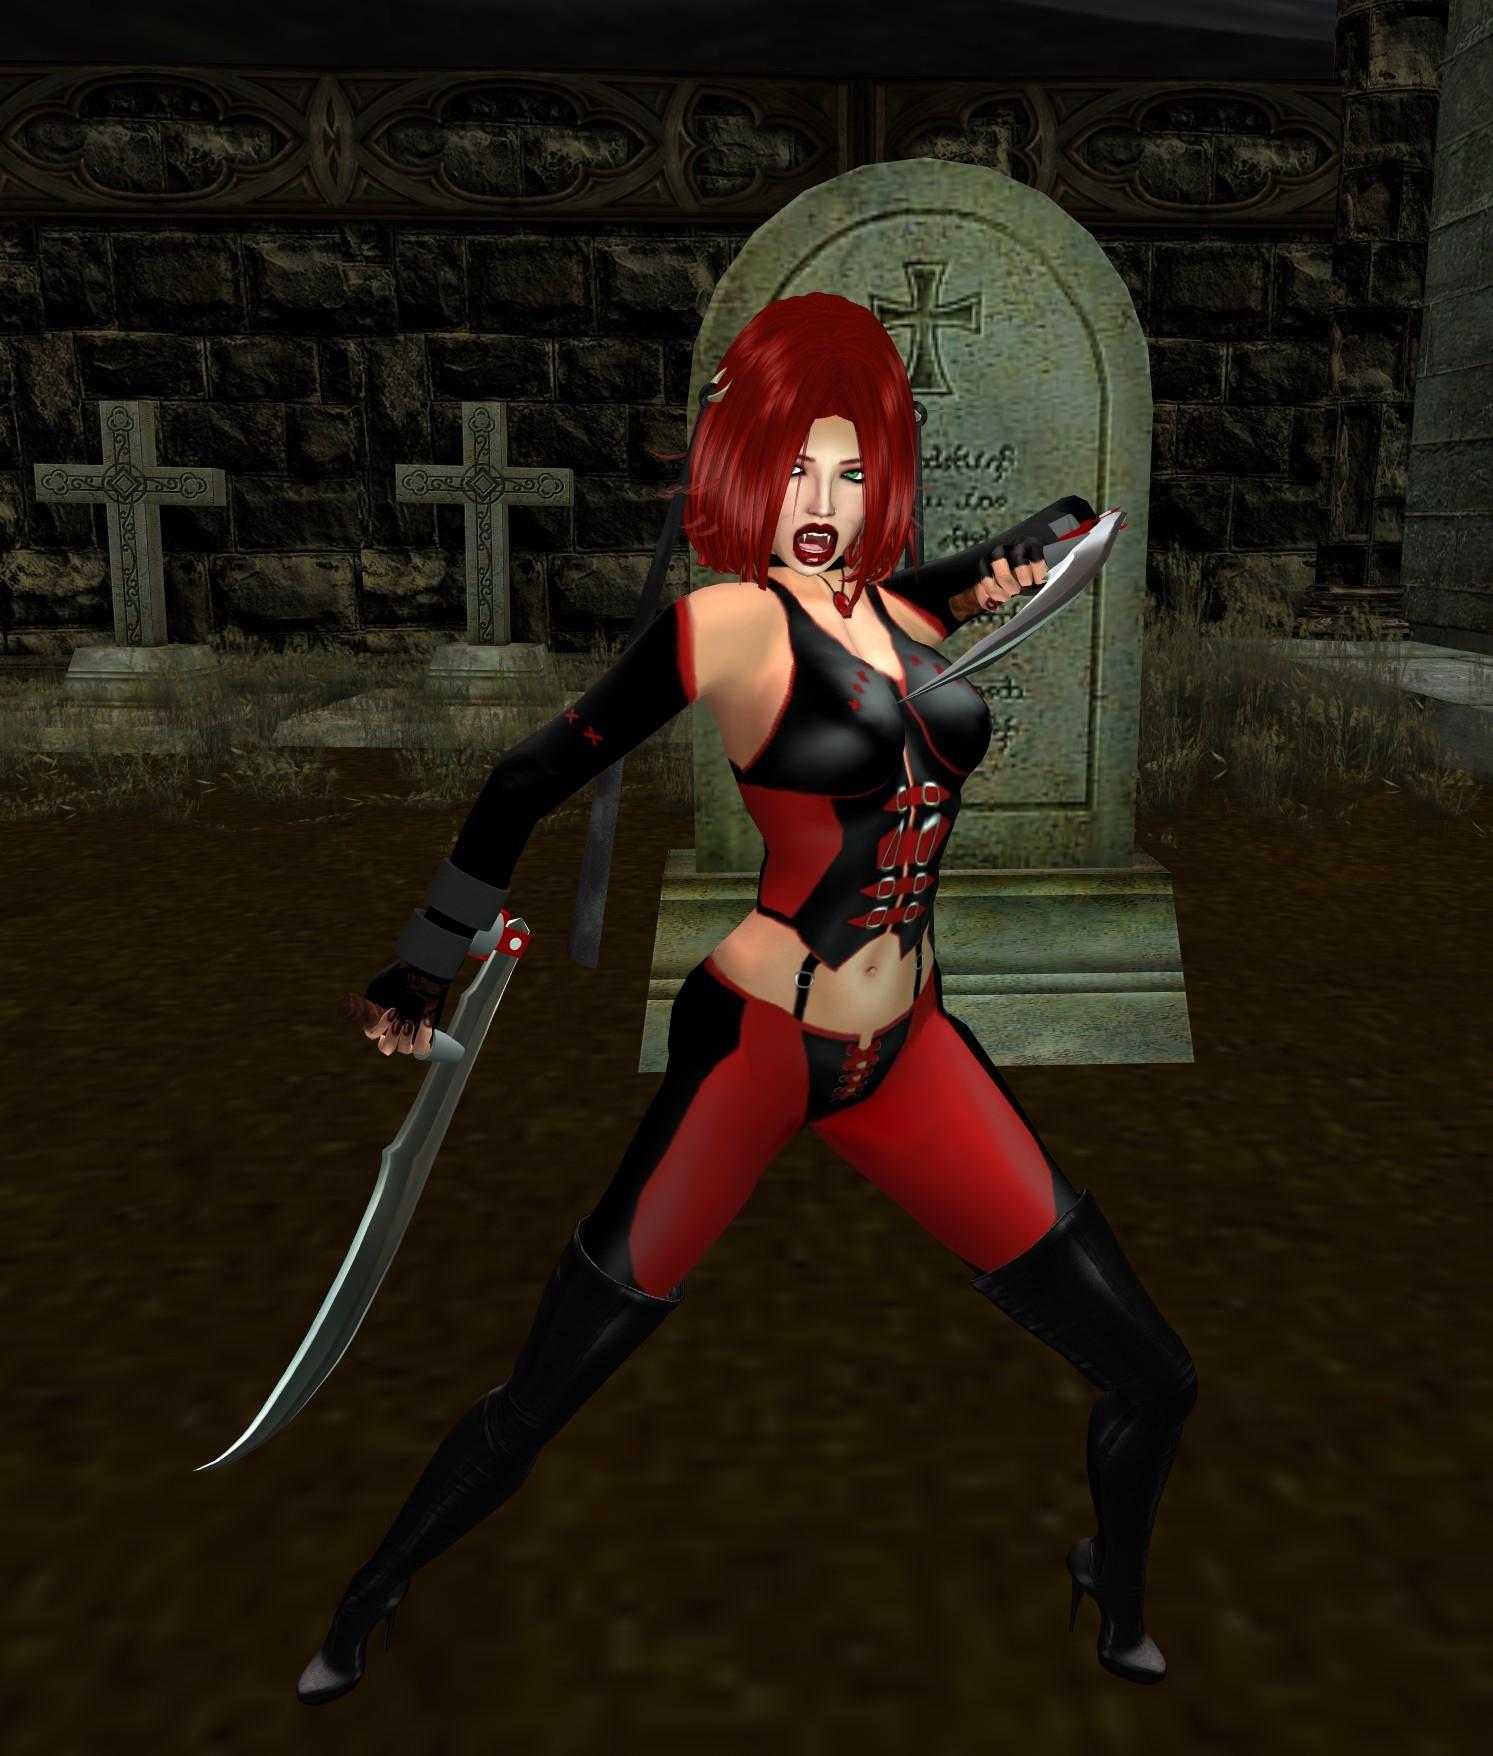 Bloodrayne 2 mods naked videos